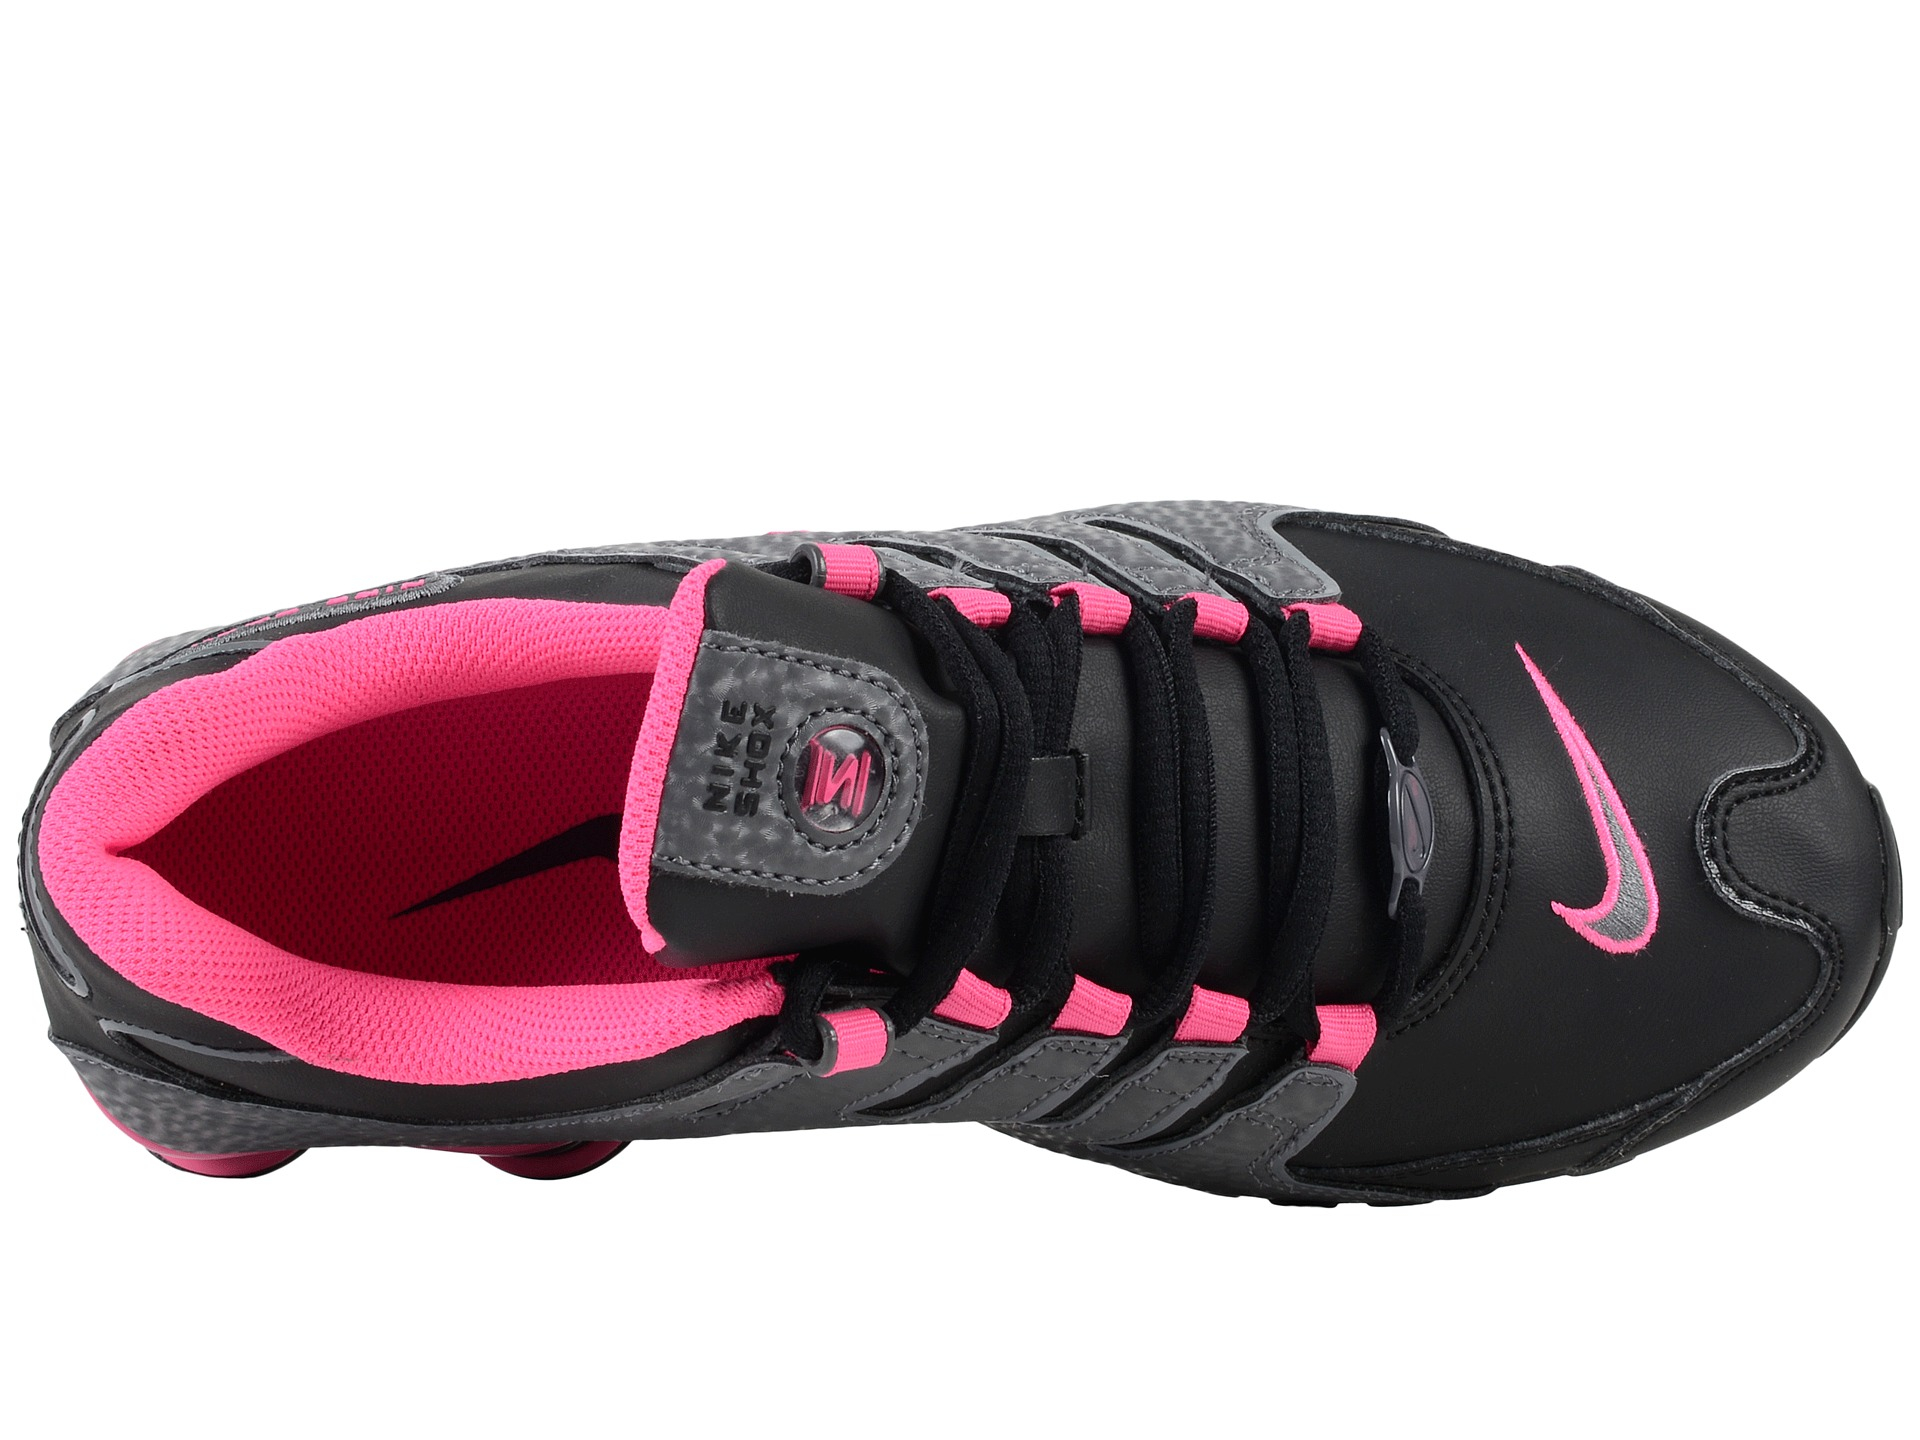 dcd29e520e1 Lyst - Nike Shox Nz in Pink